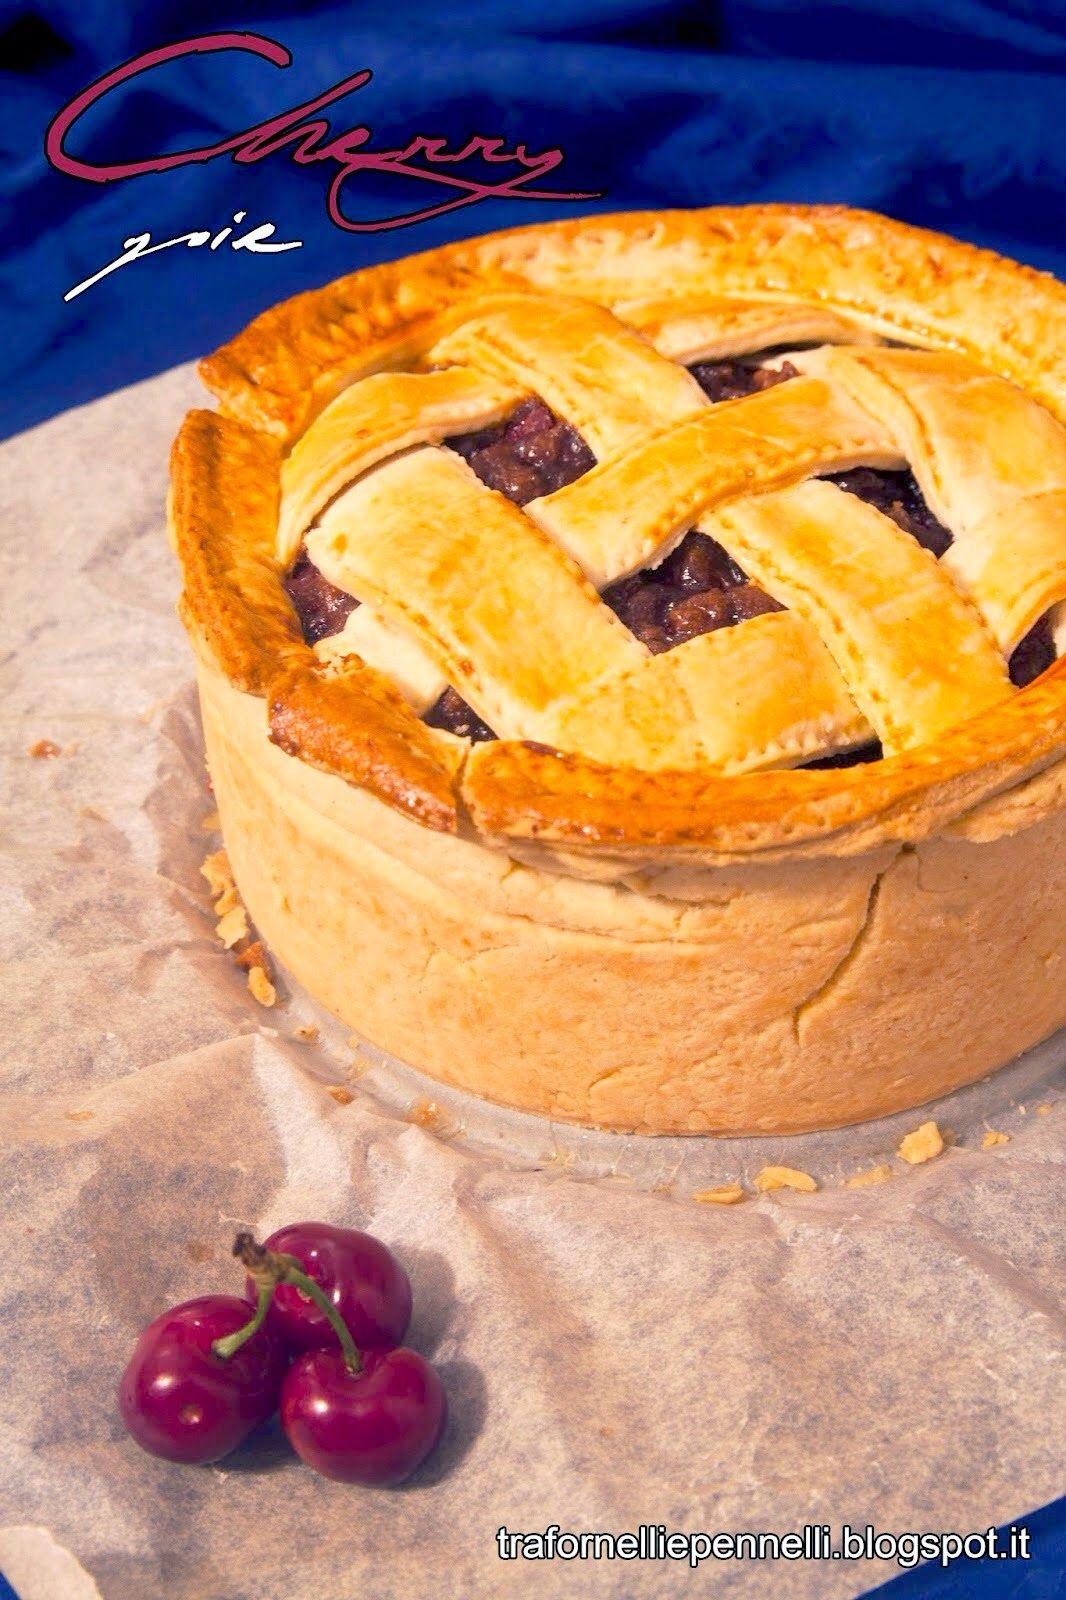 http://trafornelliepennelli.blogspot.it/2014/06/cherry-pie-e-re-cake.html